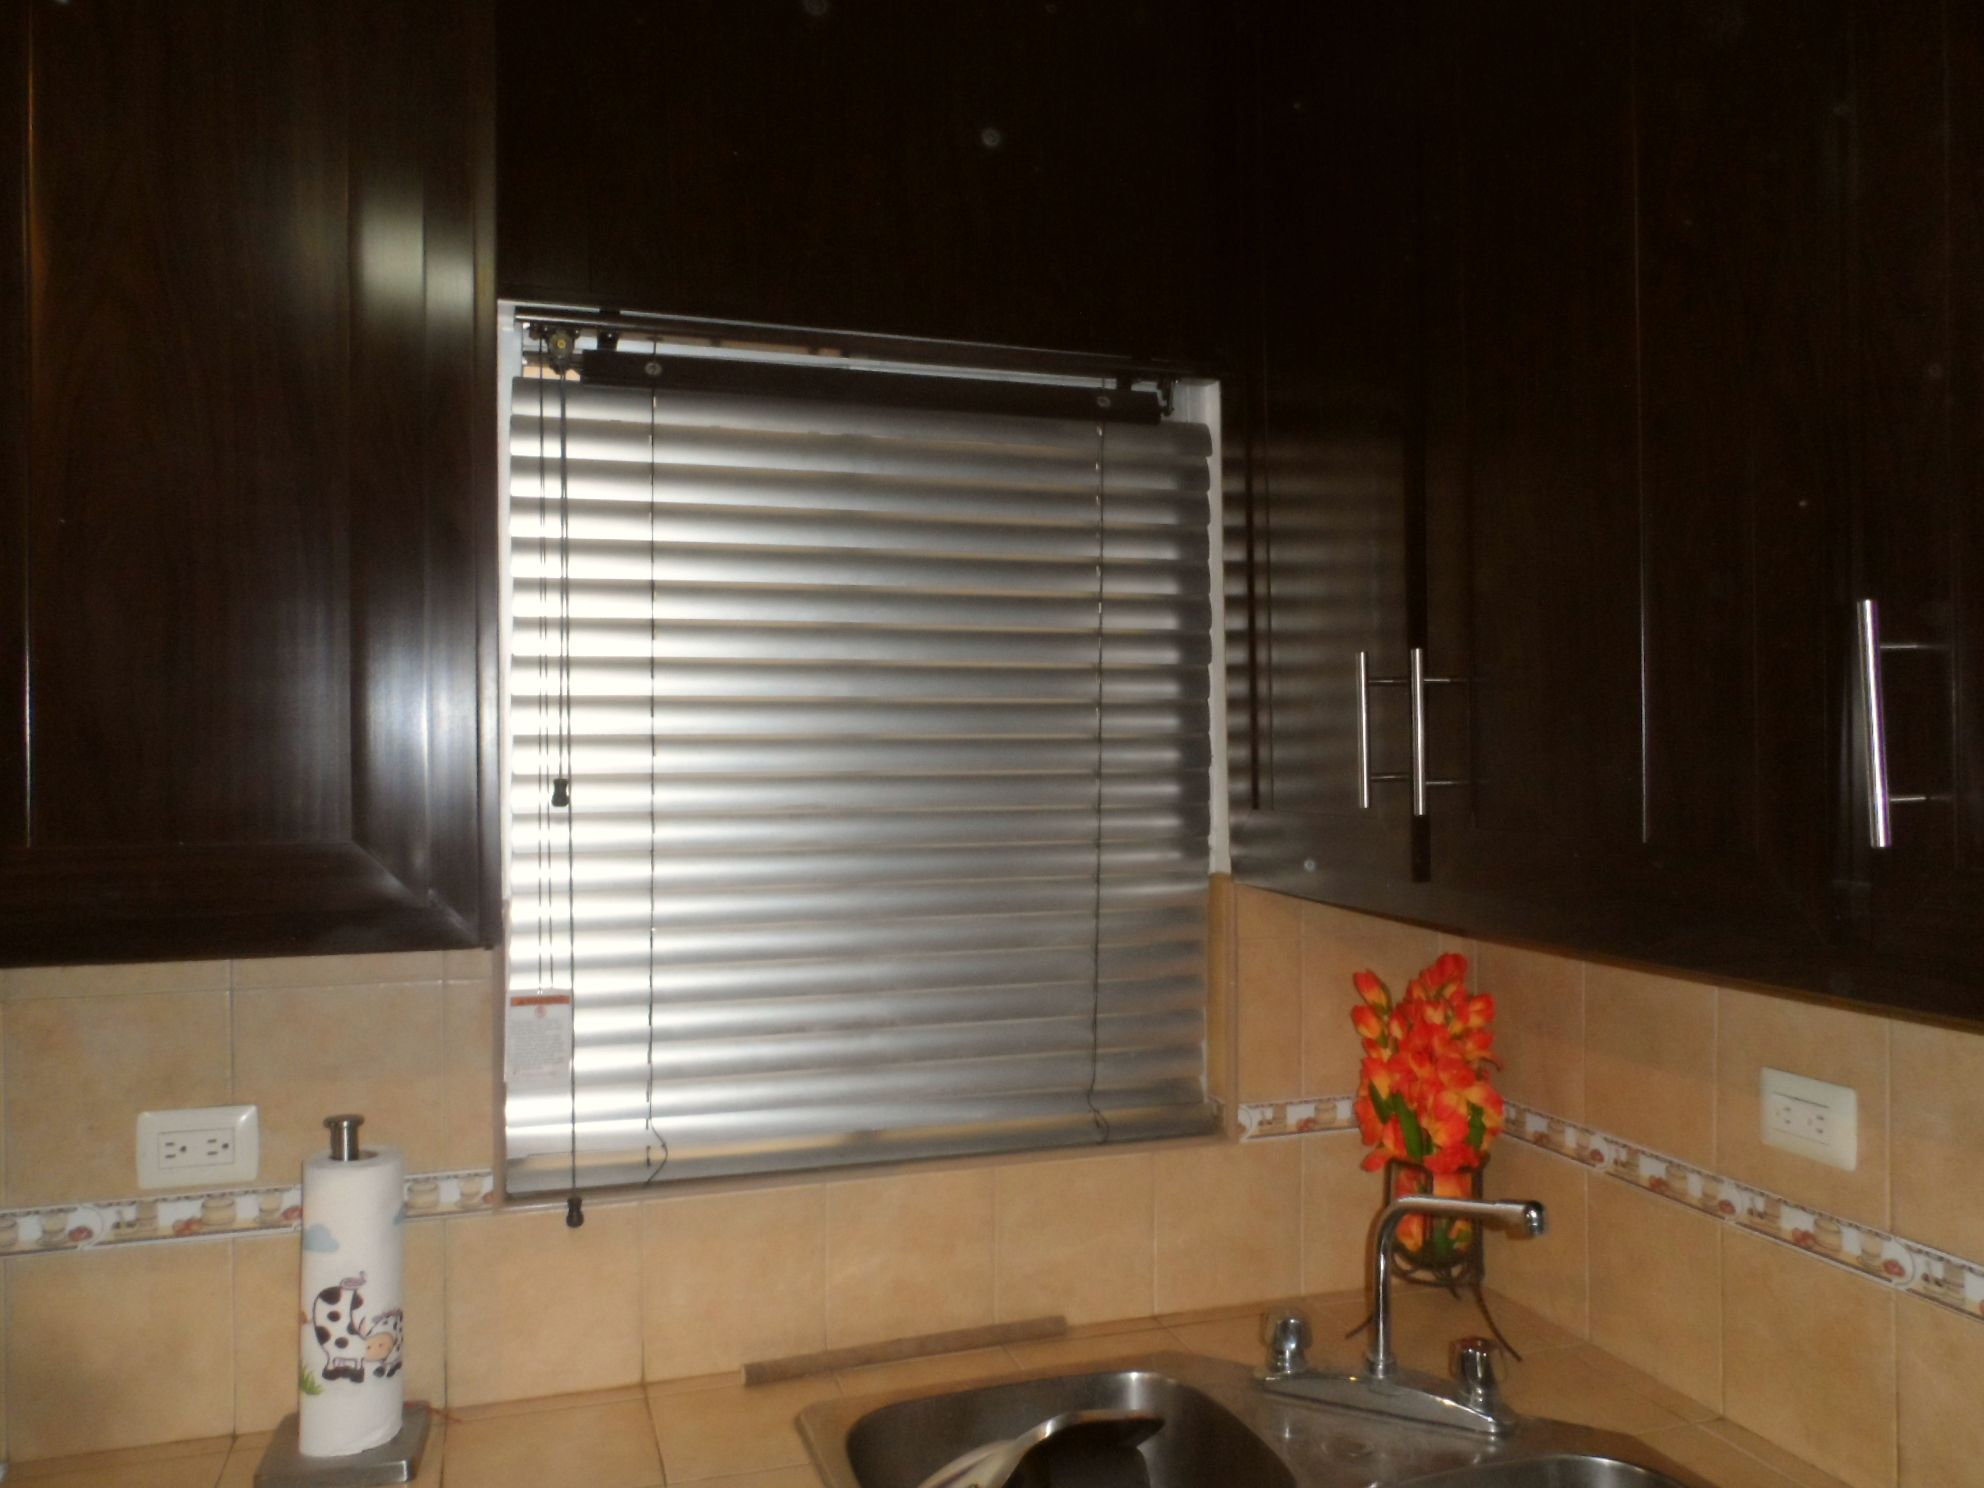 Persiana retro 2 de madera con aluminio color acero - Colocar cinta persiana ...